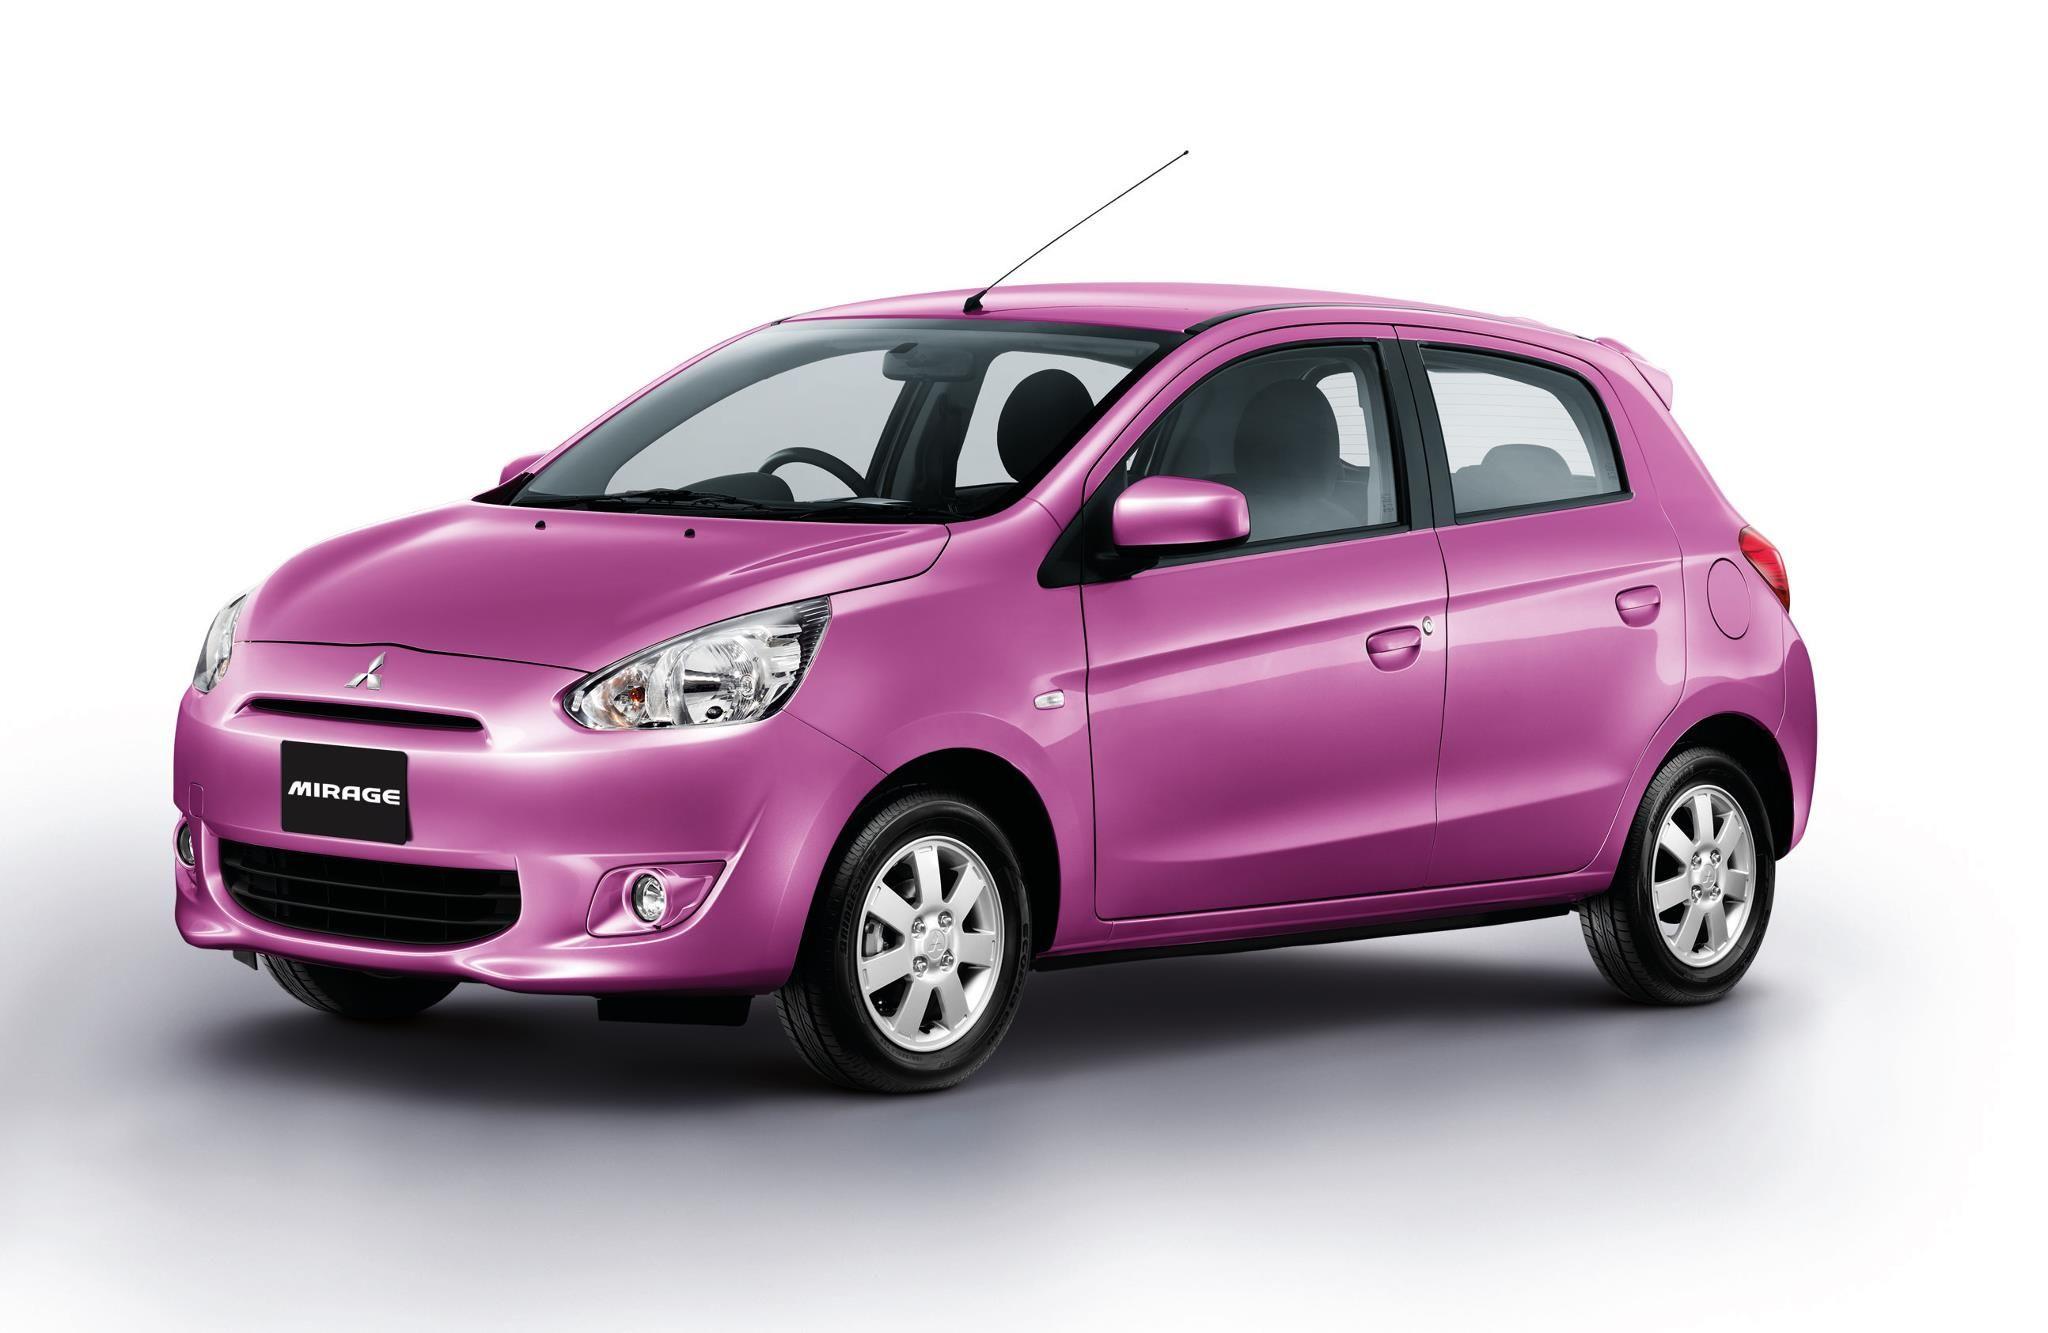 Mitsubishi Mirage Bloom Edition - Small Cars Wallpapers